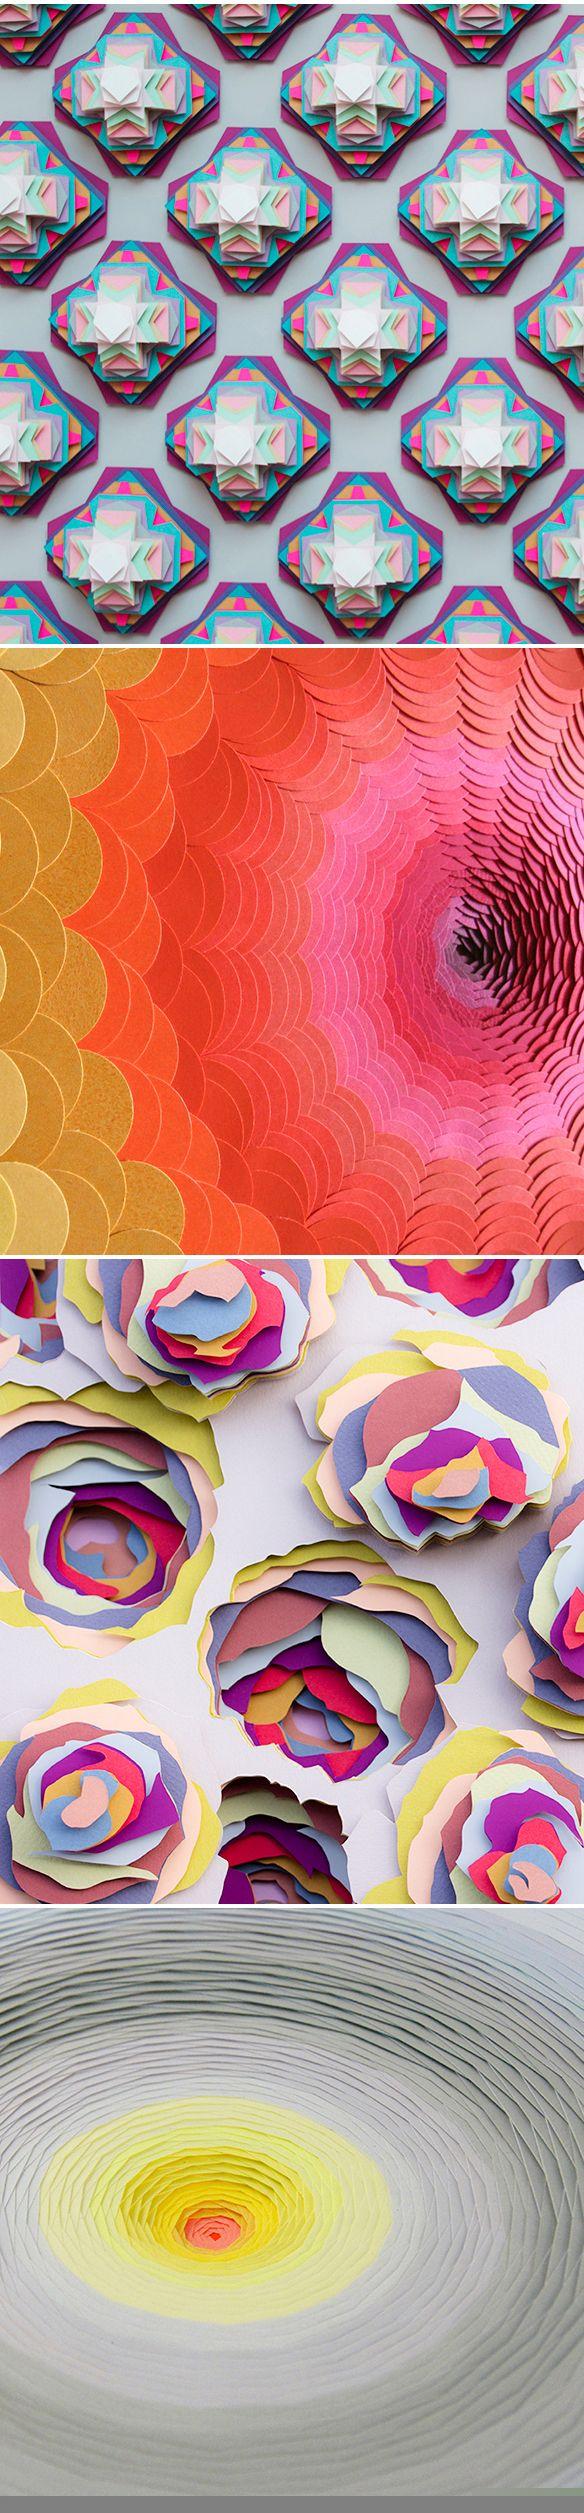 〉〉paper sculptures by Maud Vantours